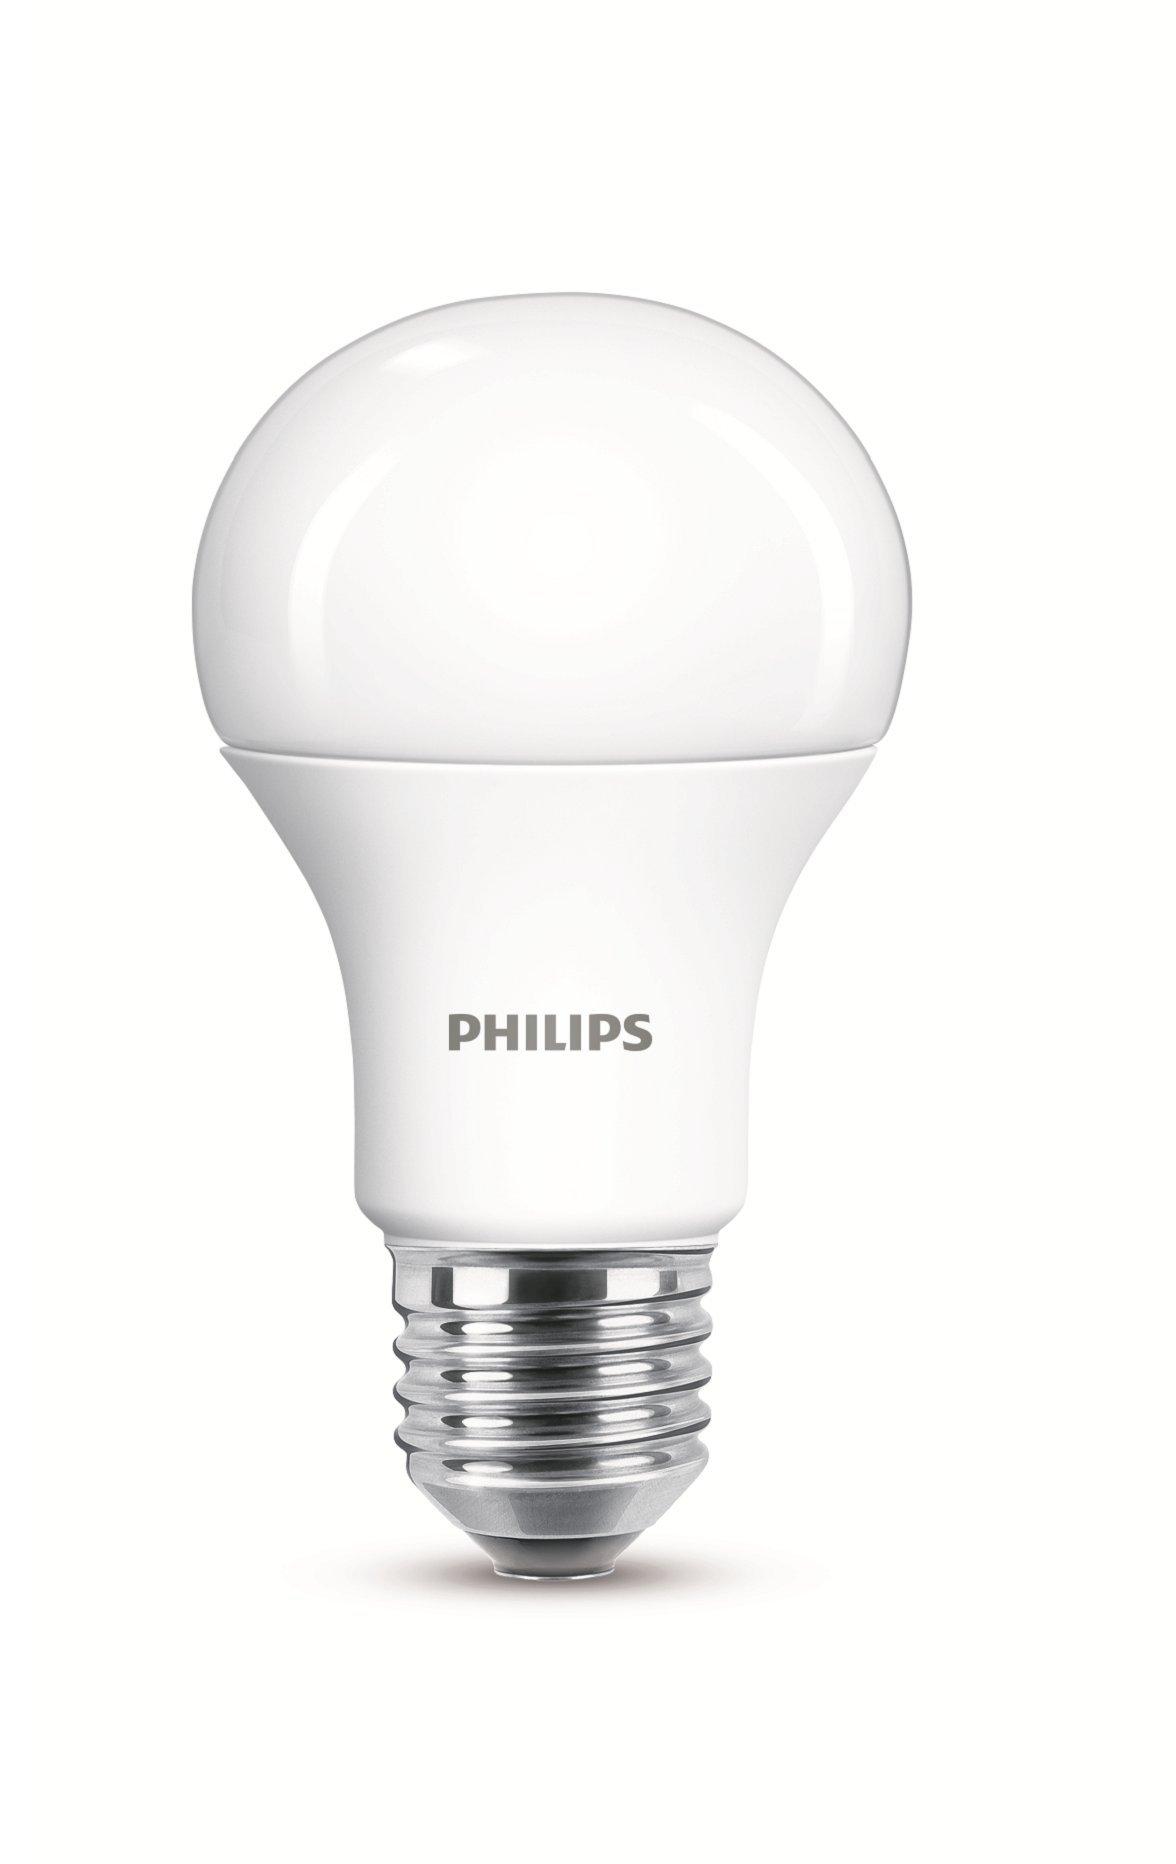 Philips LED 12.5 W (100 W) E27 A60 Edison bulb, cold ground daylight, 6500 K